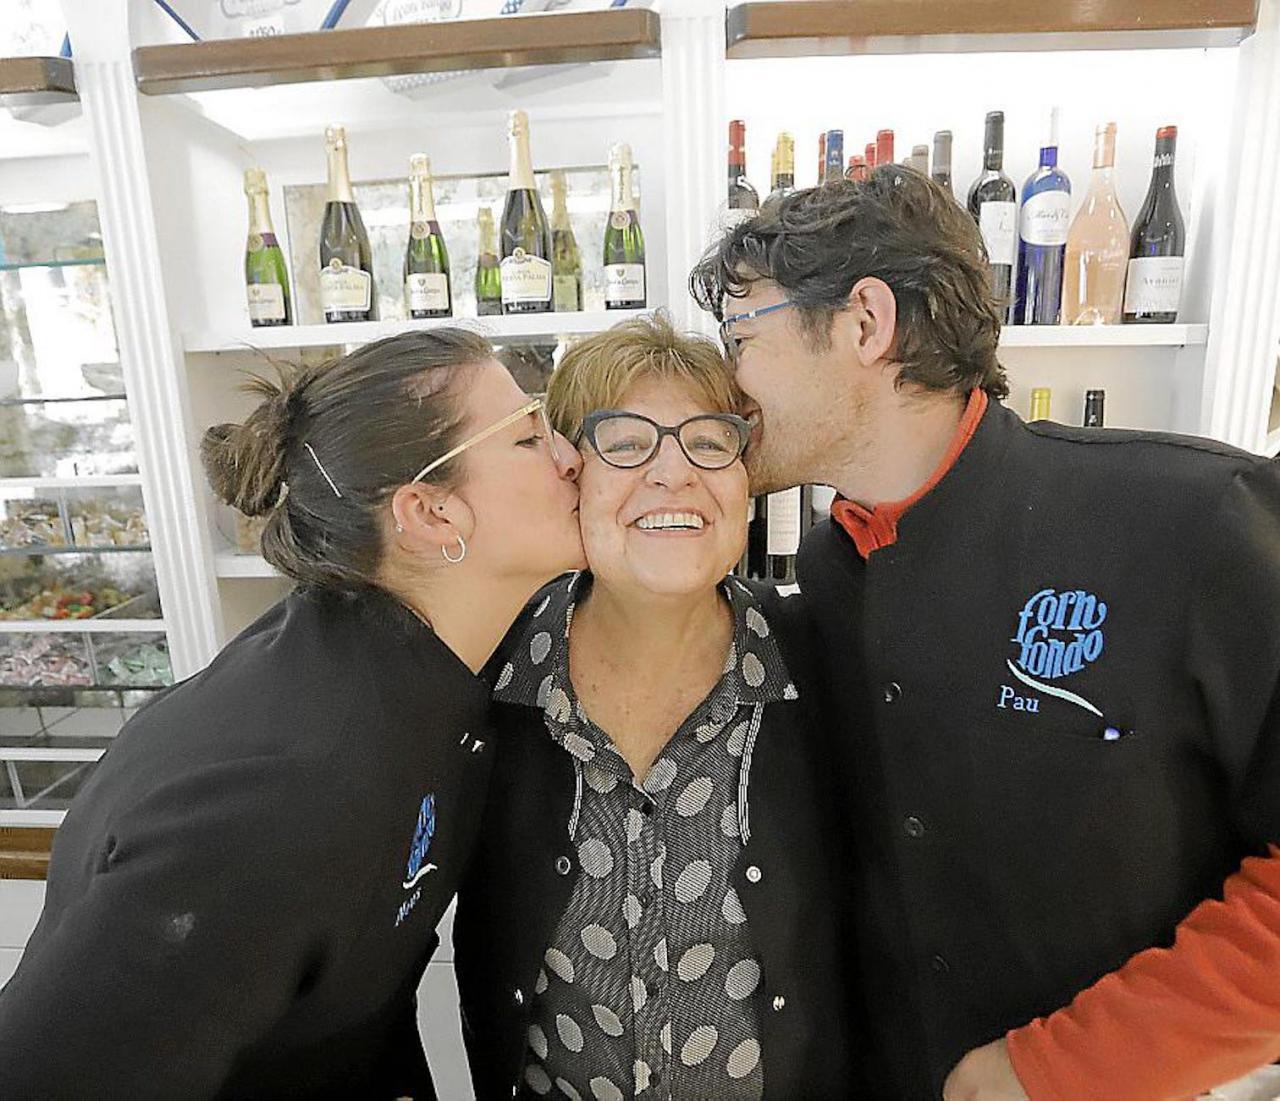 Margarita Riera, Neus & Pau Llull at Forn Fondo.